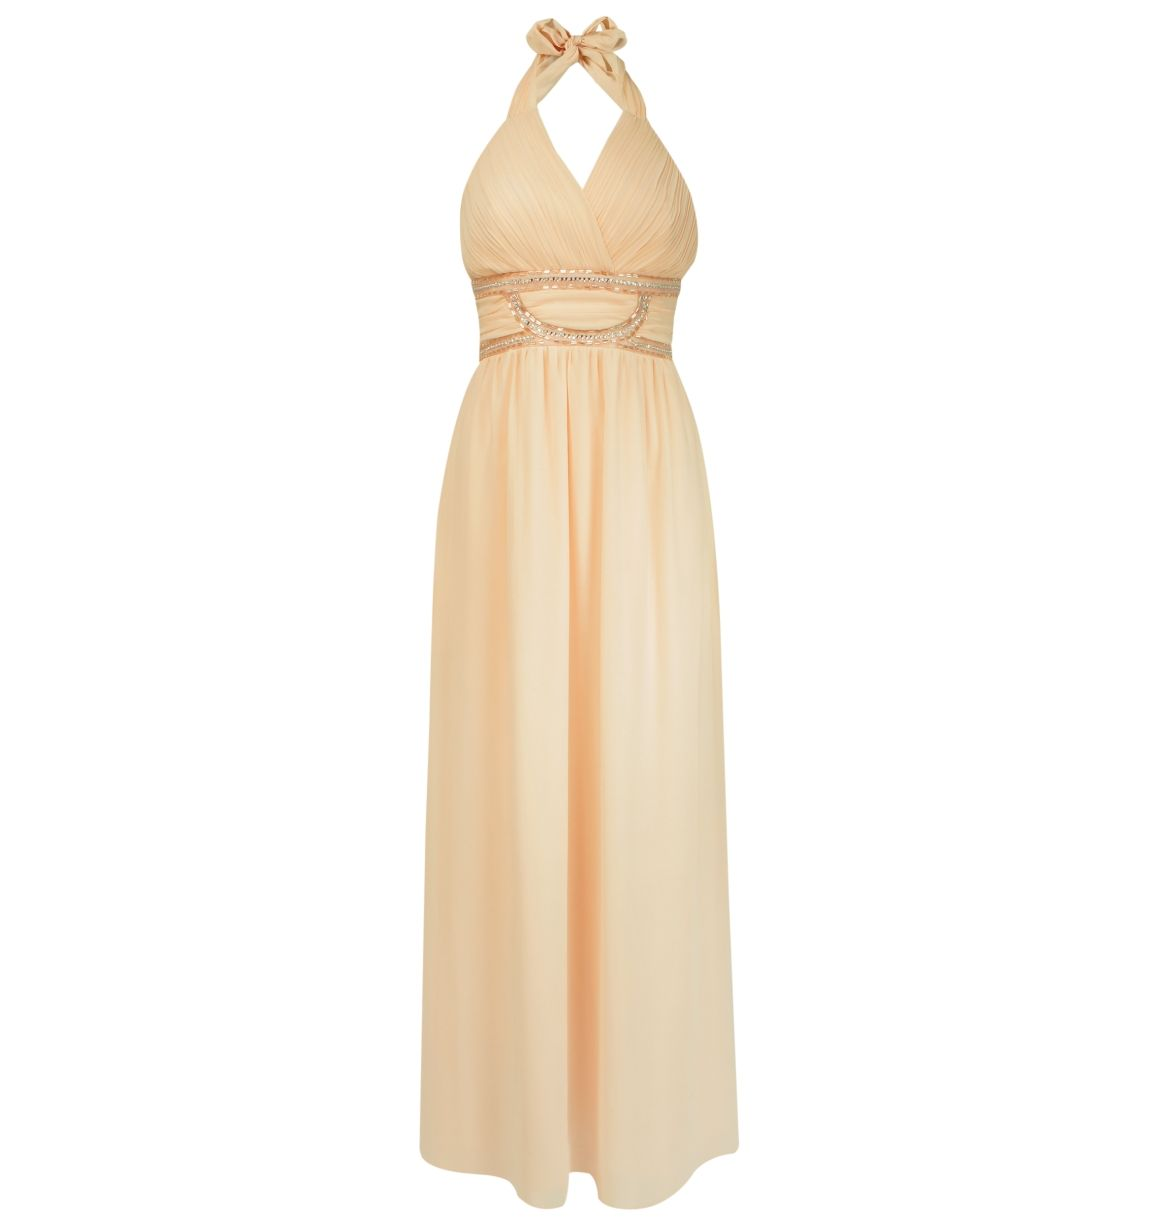 Chiffon Maxi Dress at foschini. I want this dress | fashion ...